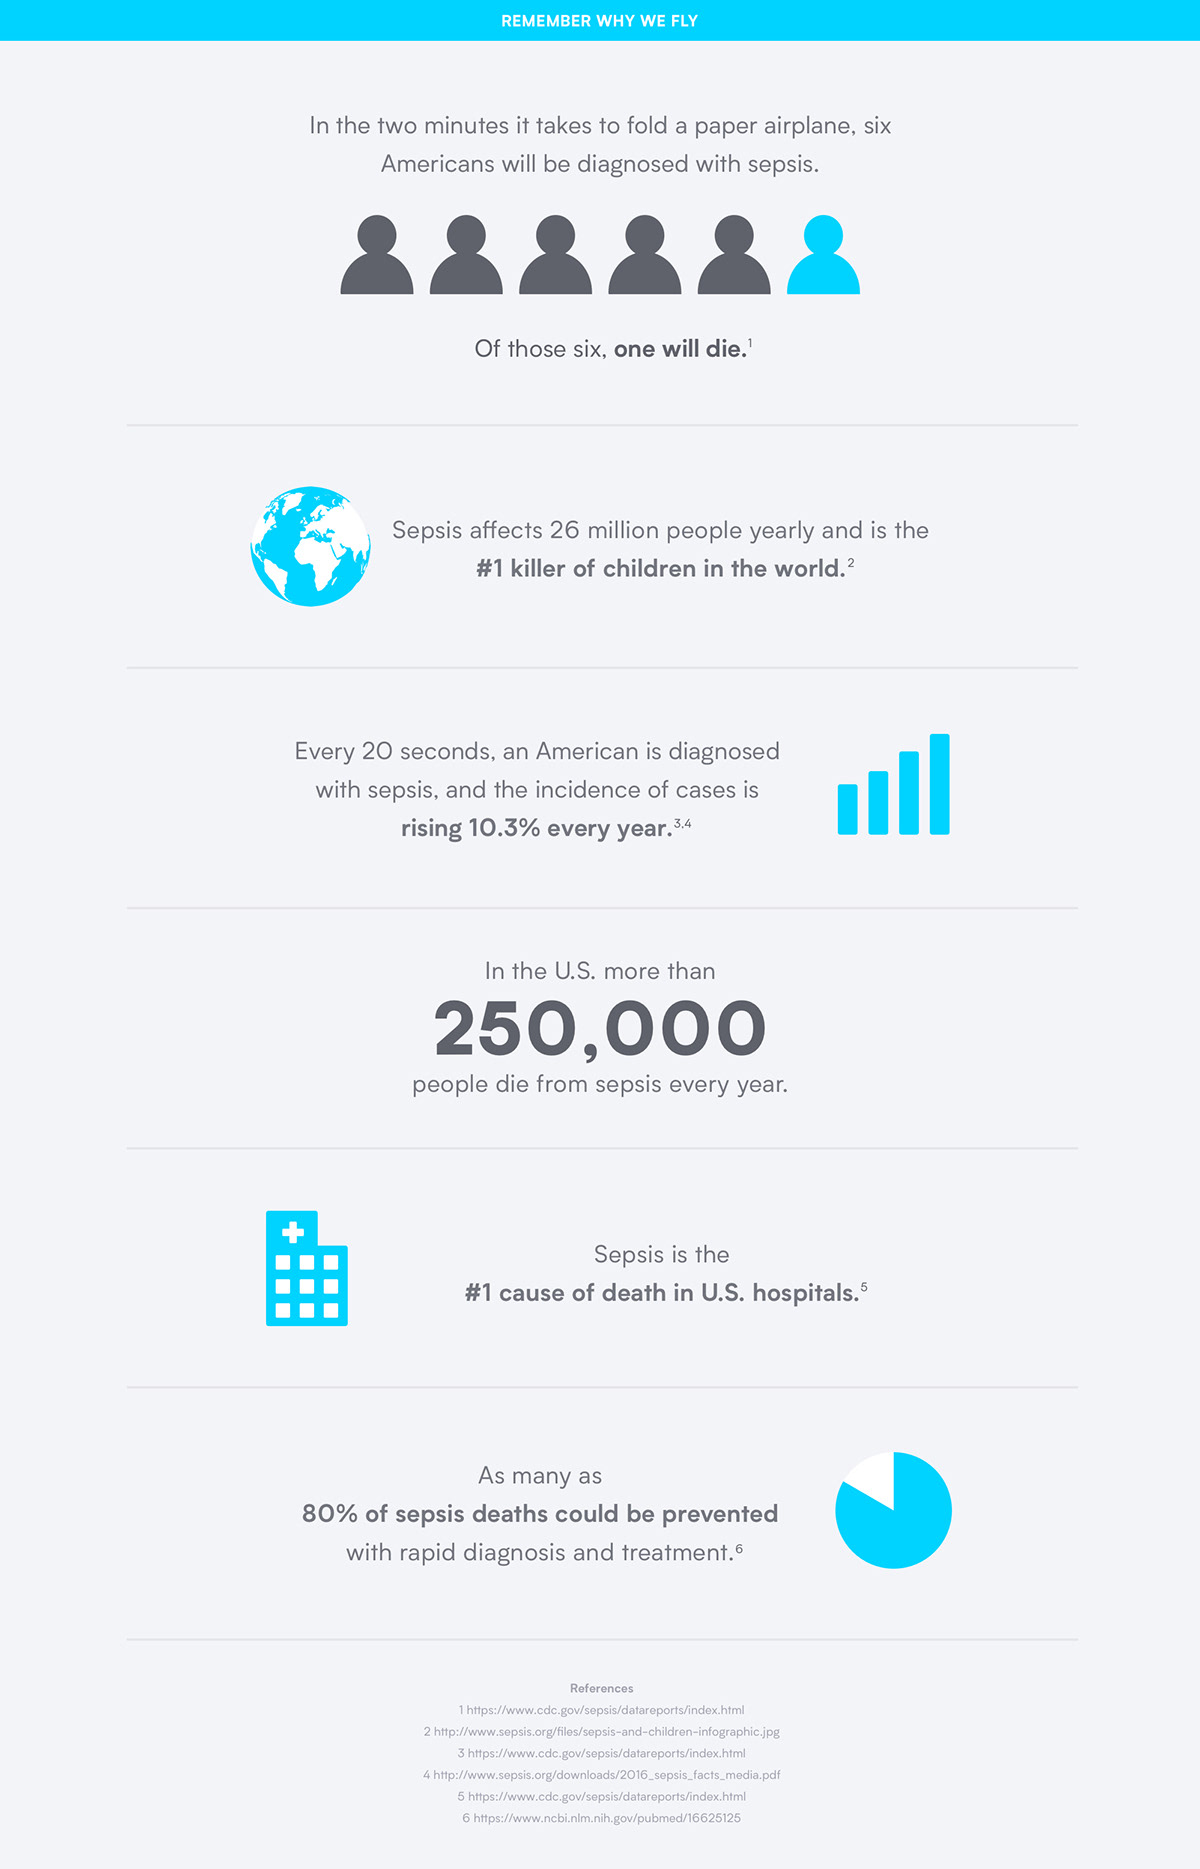 Health healthcare sepsis psa infographic Public Health